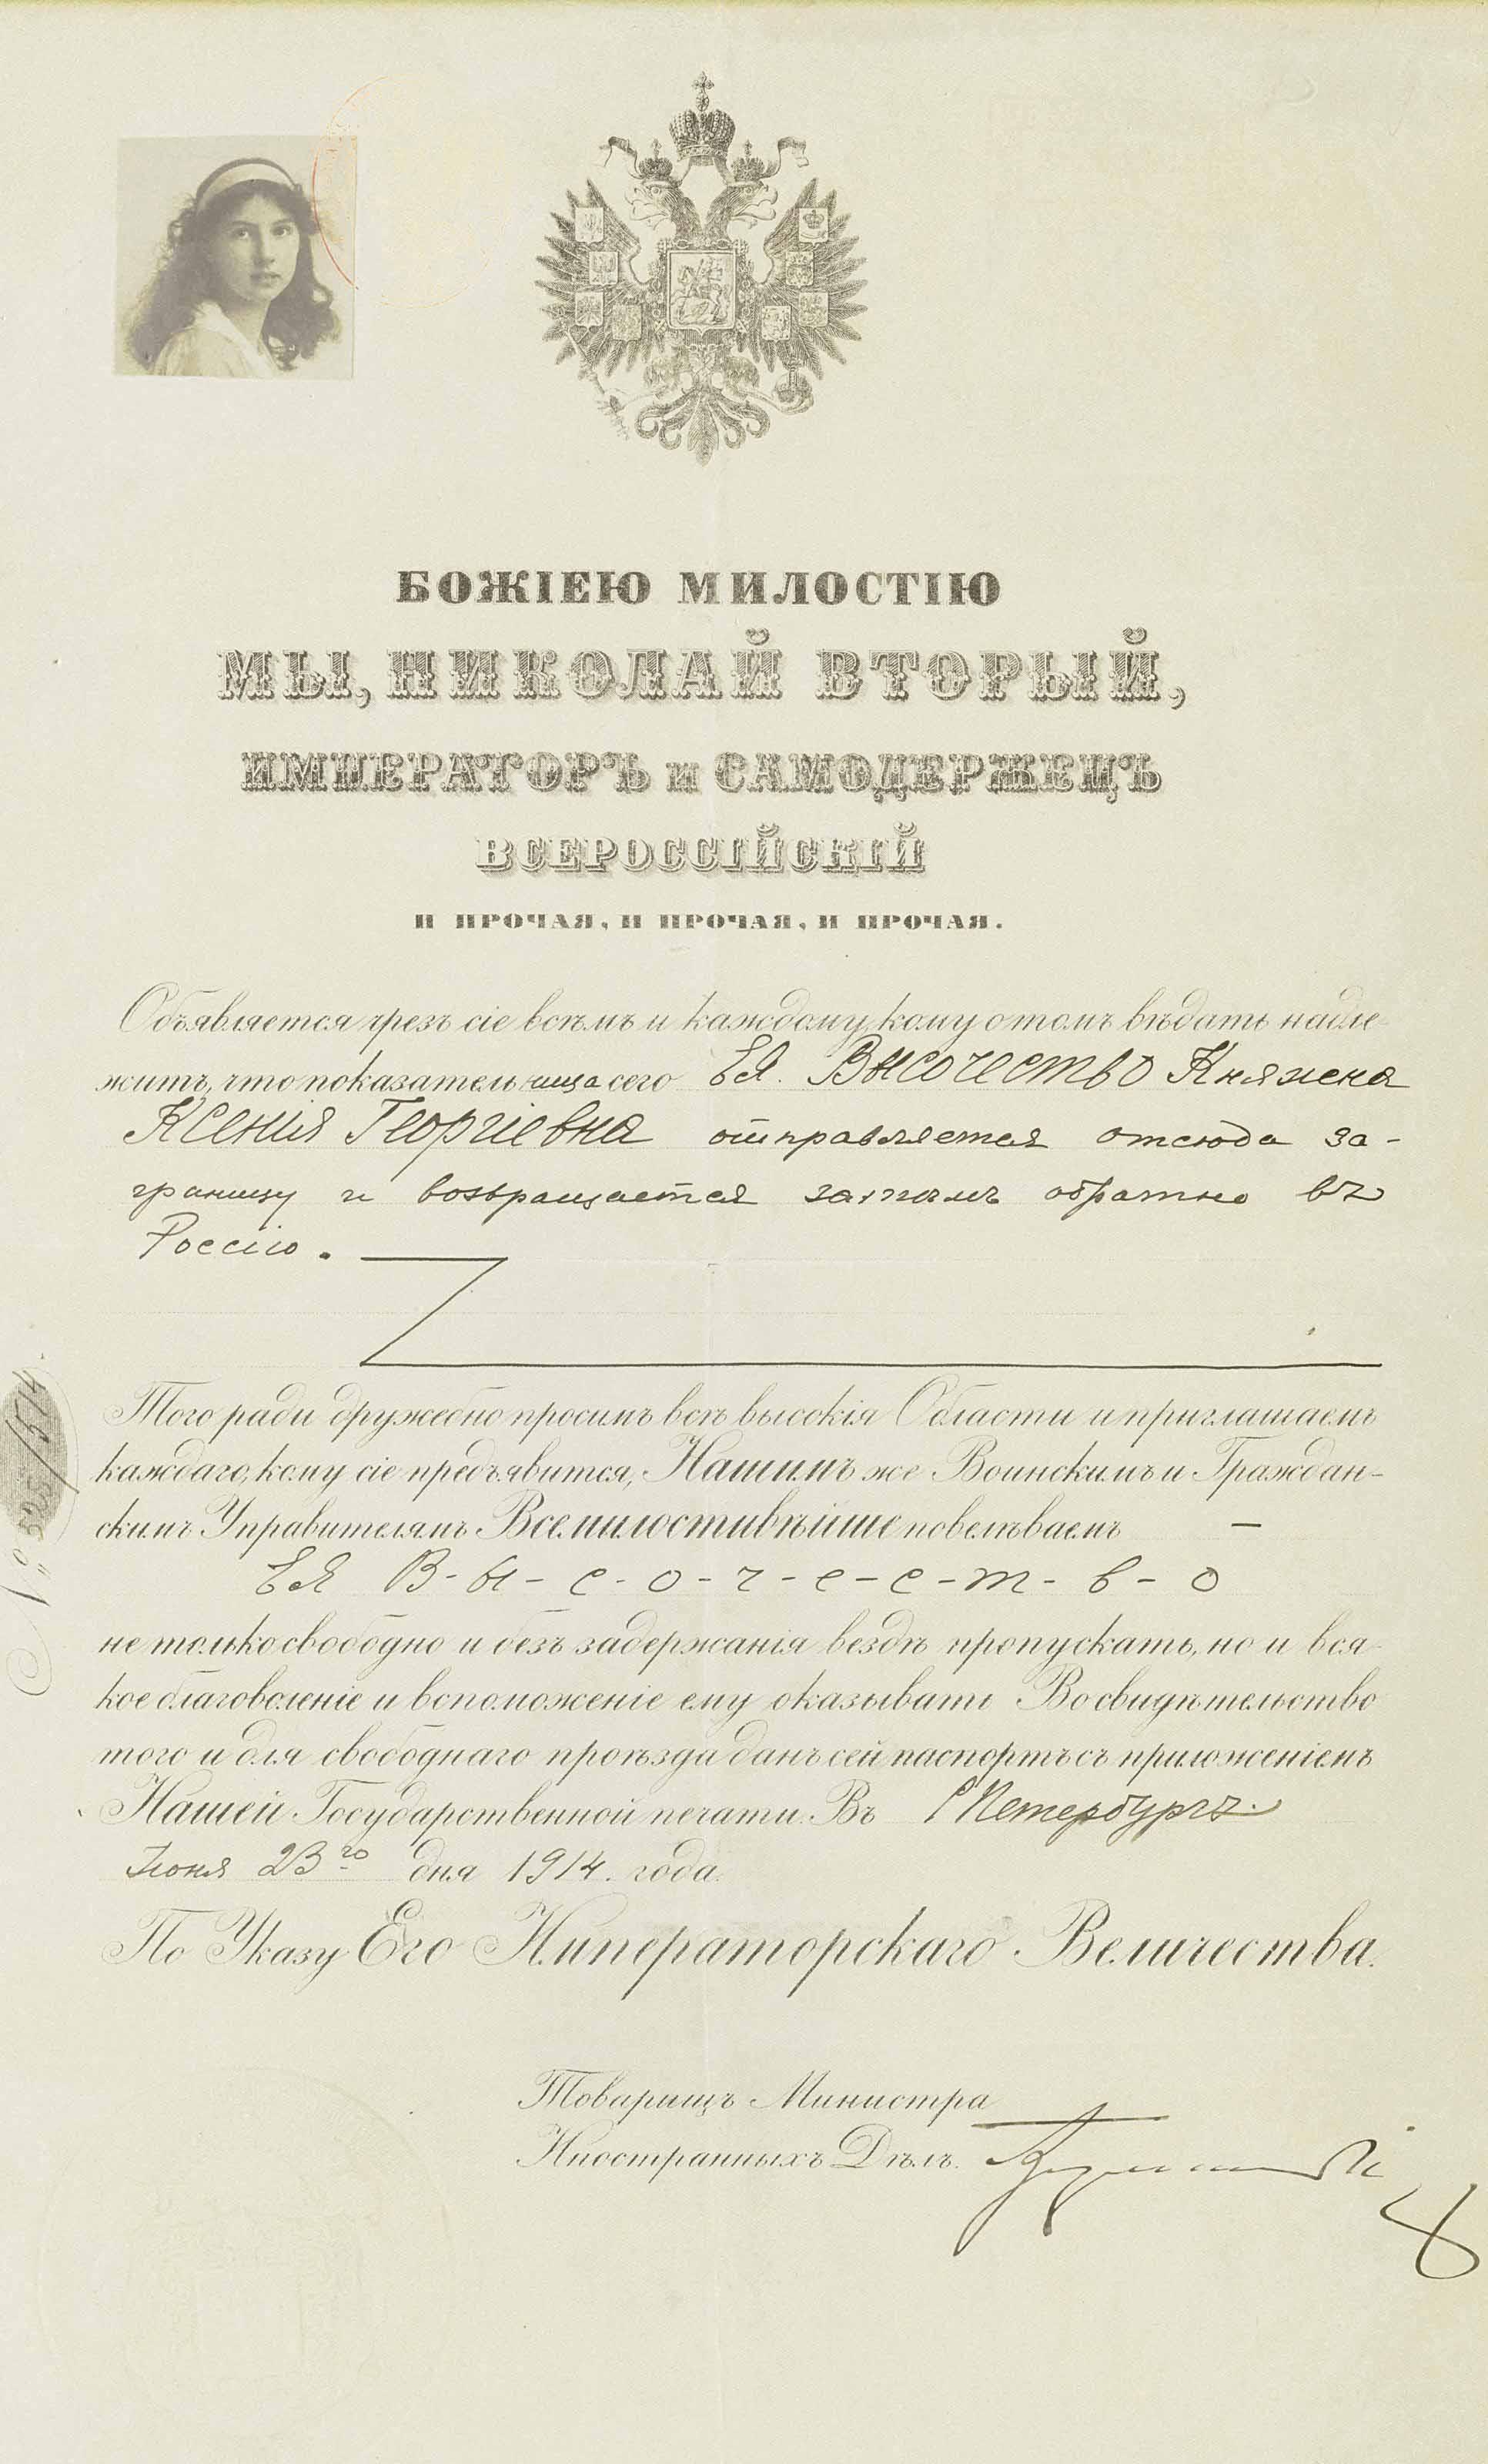 PRINCESS XENIA GEORGIEVNA: A RUSSIAN PASSPORT